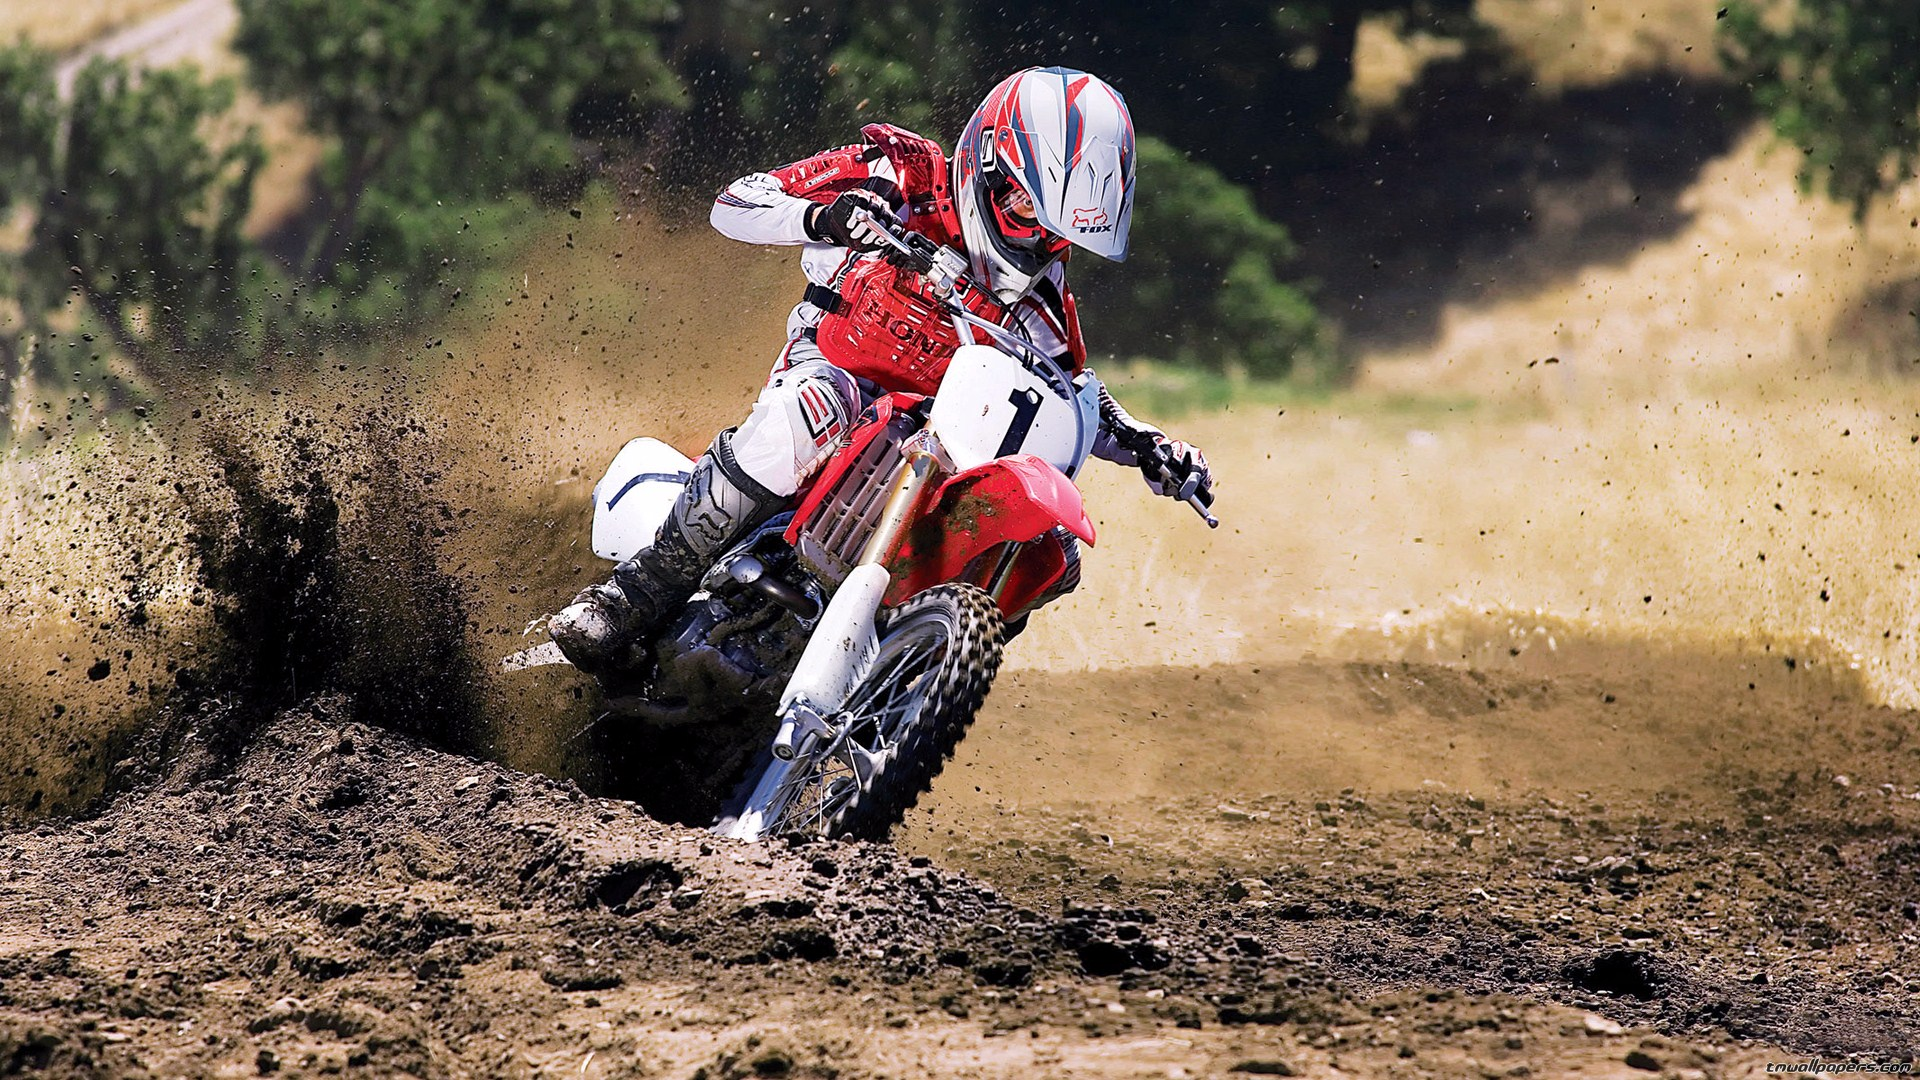 Dirt Bike Motocross Wallpaper HD 11 High Resolution Wallpaper Full 1920x1080